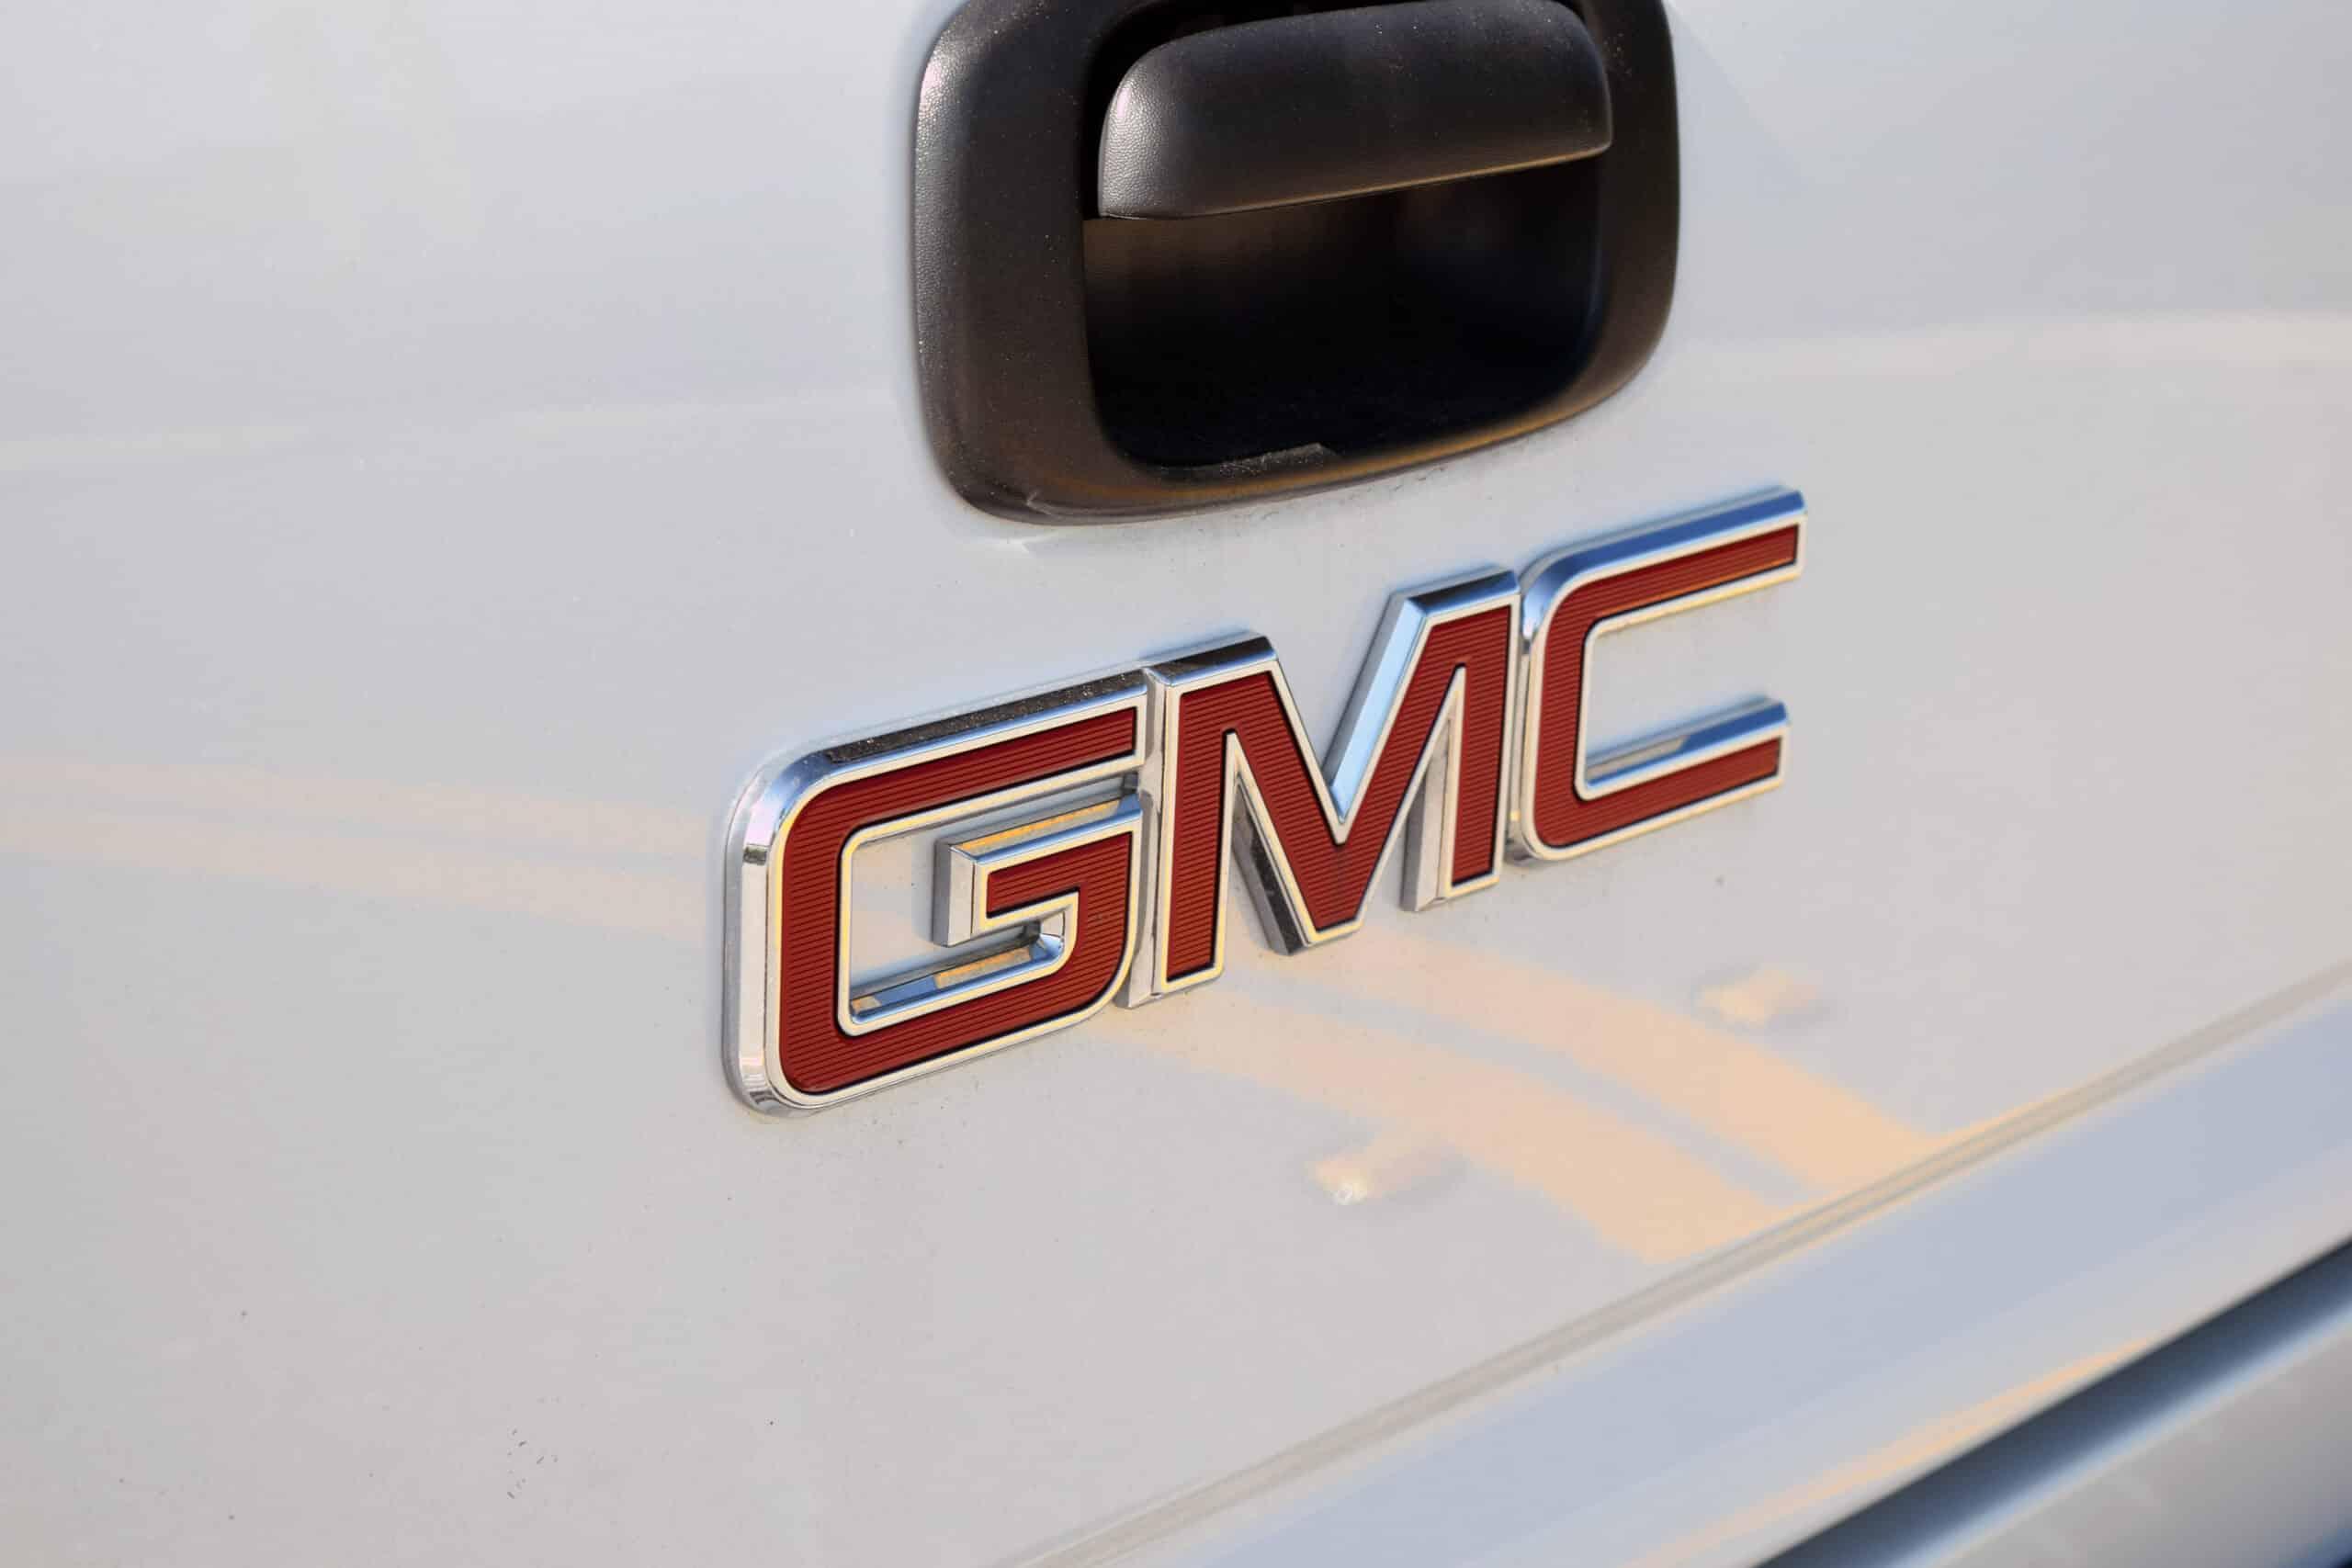 GMC 5500, LOW MILE, VERY RARE MONROE KODIAK CONVERSION, KELDERMAN SUSPENSION, PRODIGY BRAKE CONTROLER, REYCO AIR CONTROL KIT